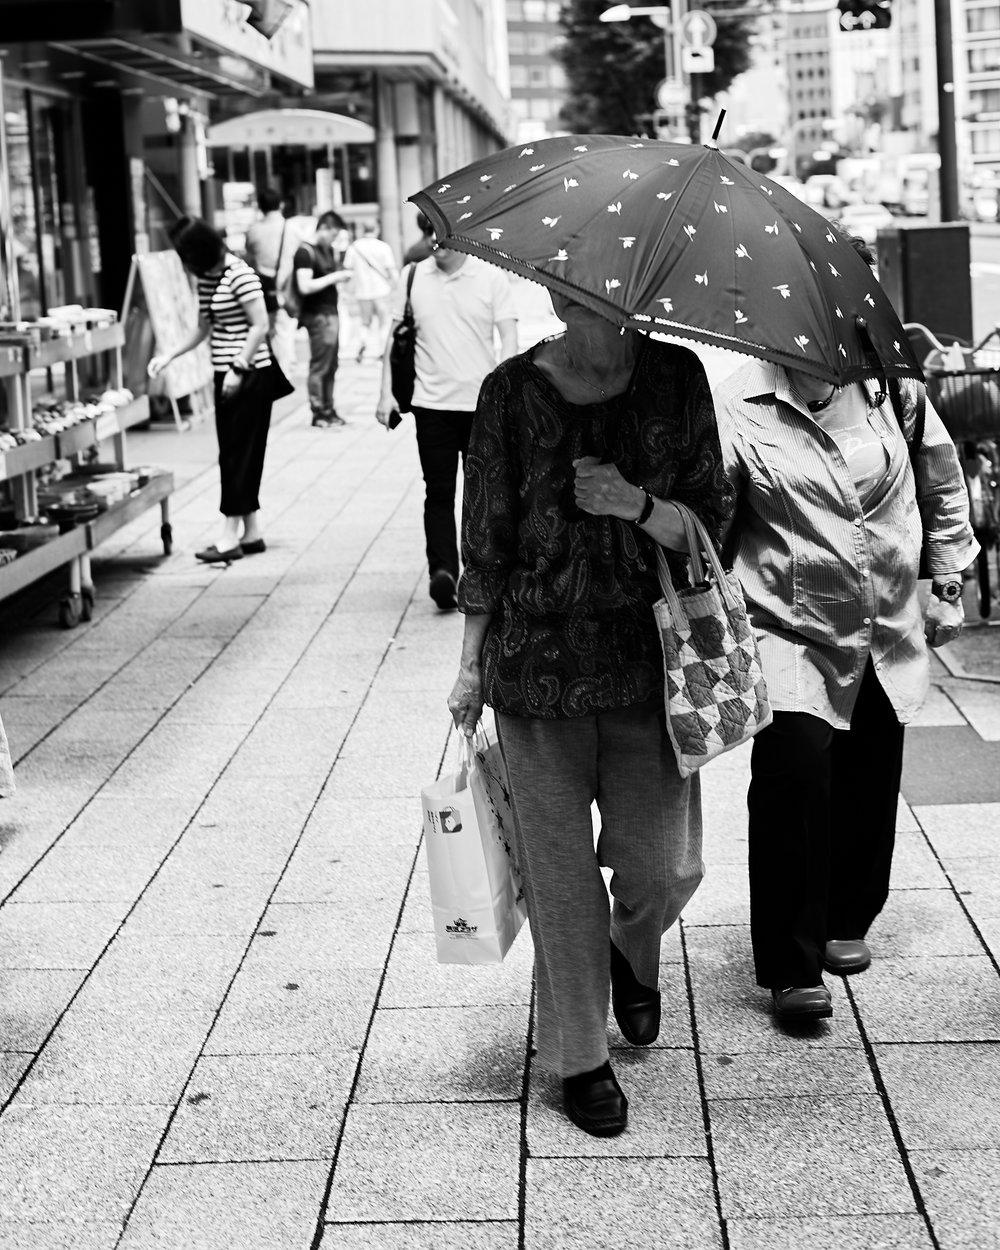 SnapPilots_17-07-05_Tokyo2017_bnw_44.jpg